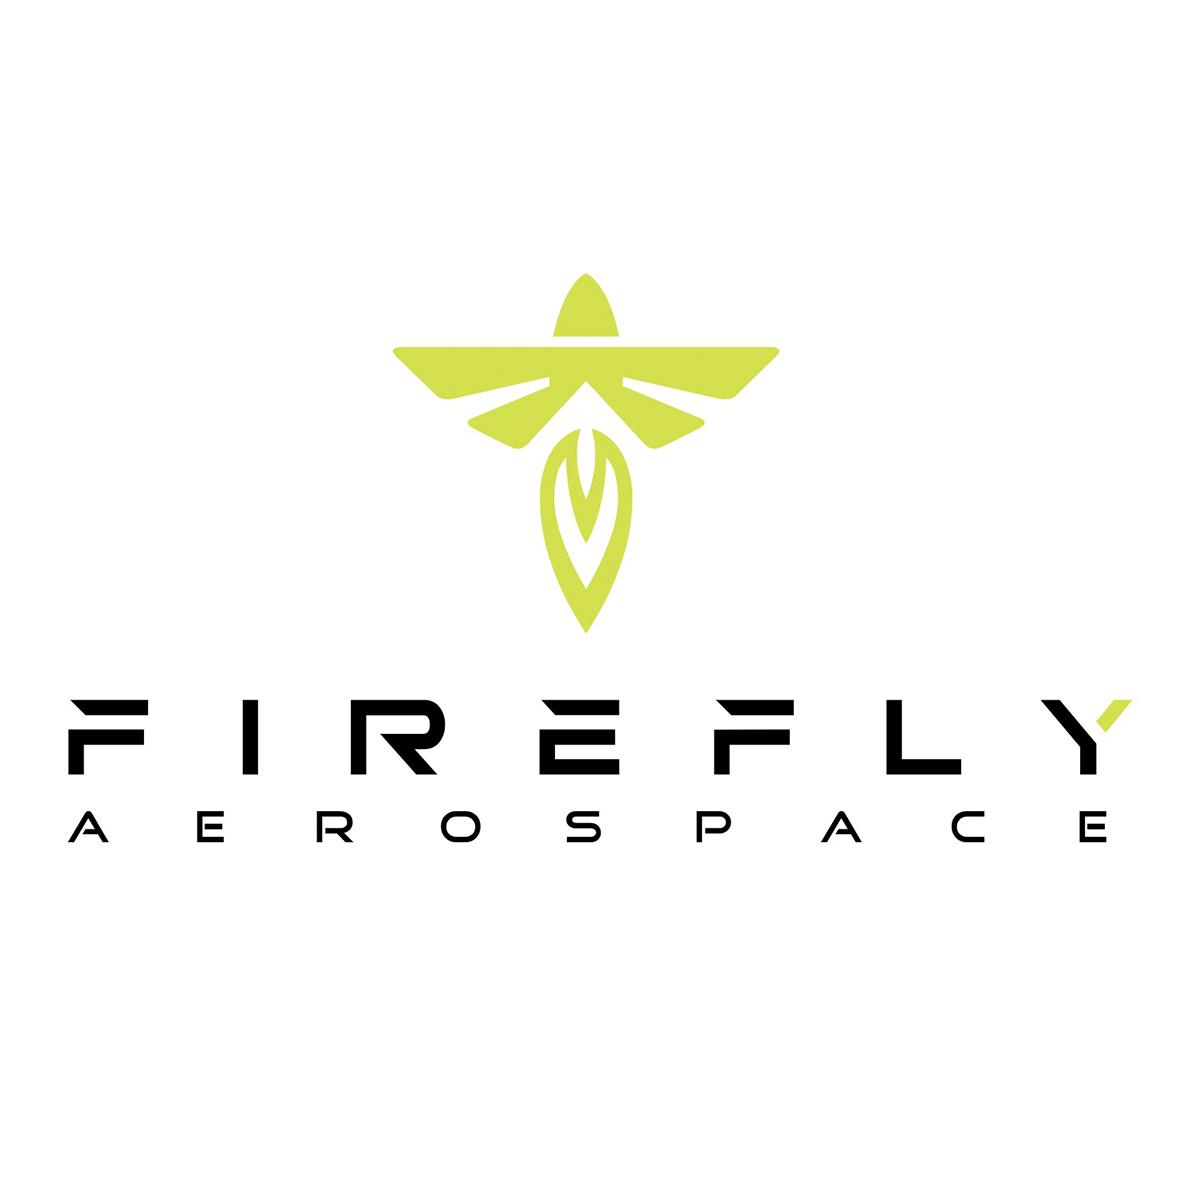 fireflylogosq.png